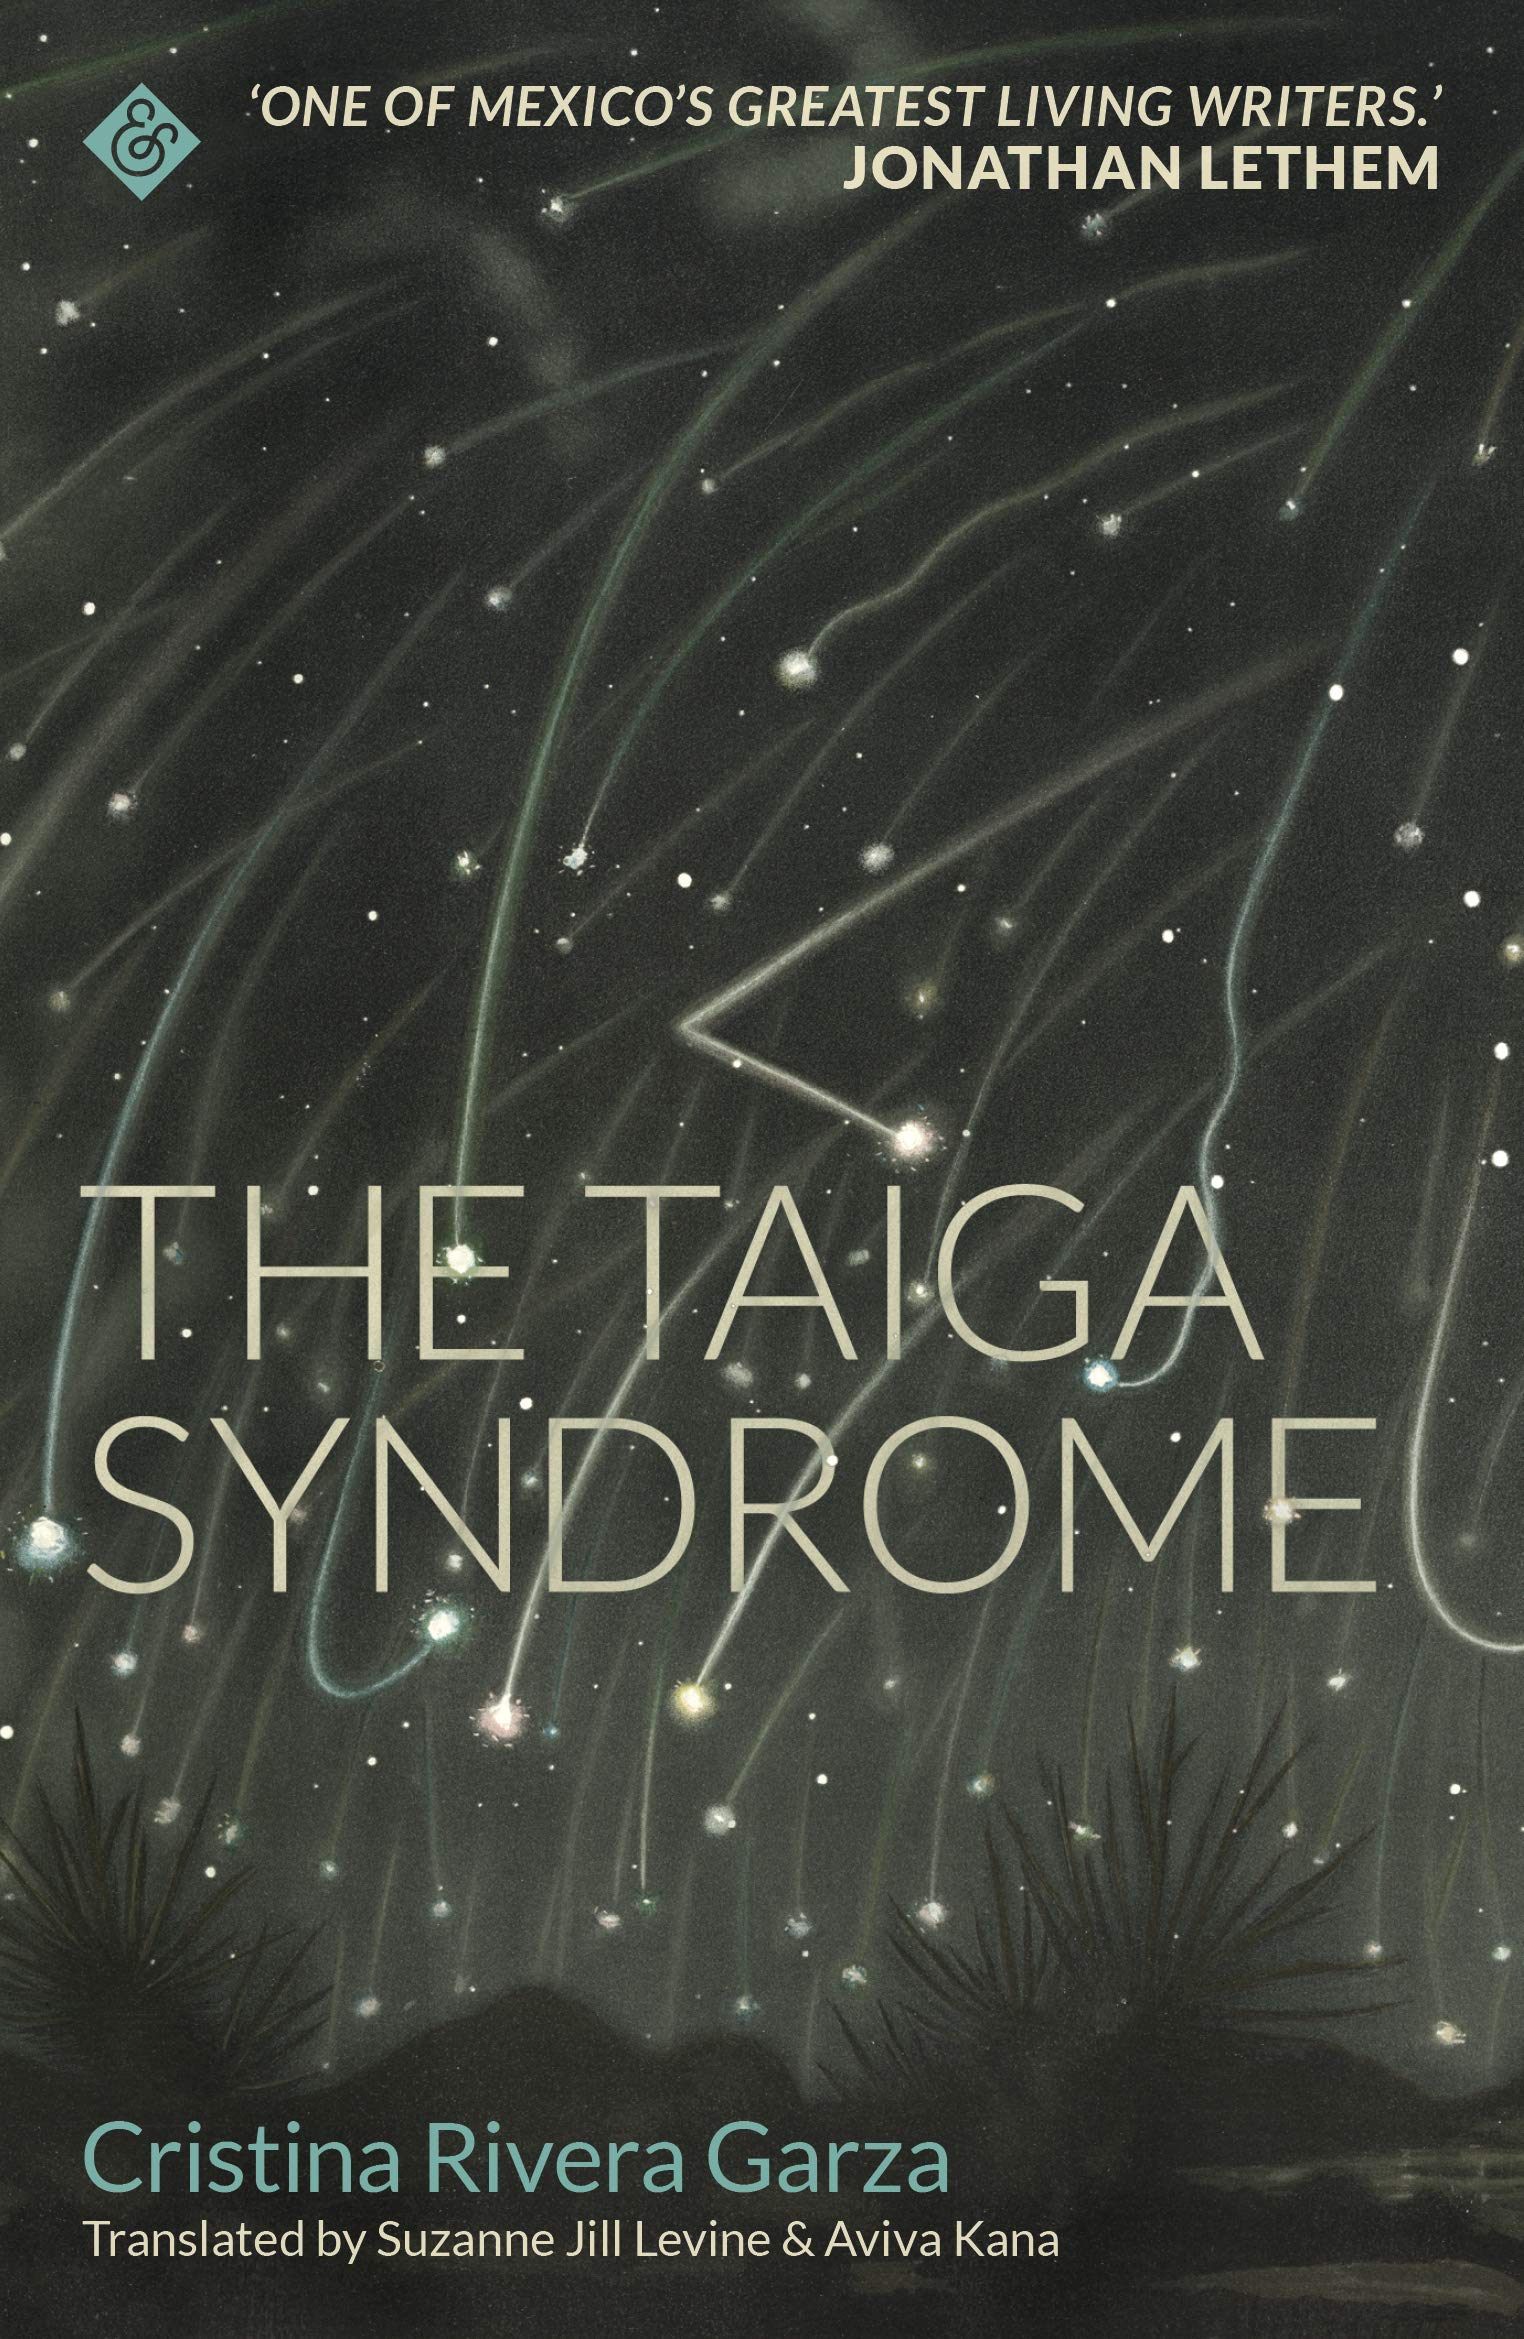 The Taiga Syndrome Amazon.co.uk Cristina Rivera Garza, Suzanne ...